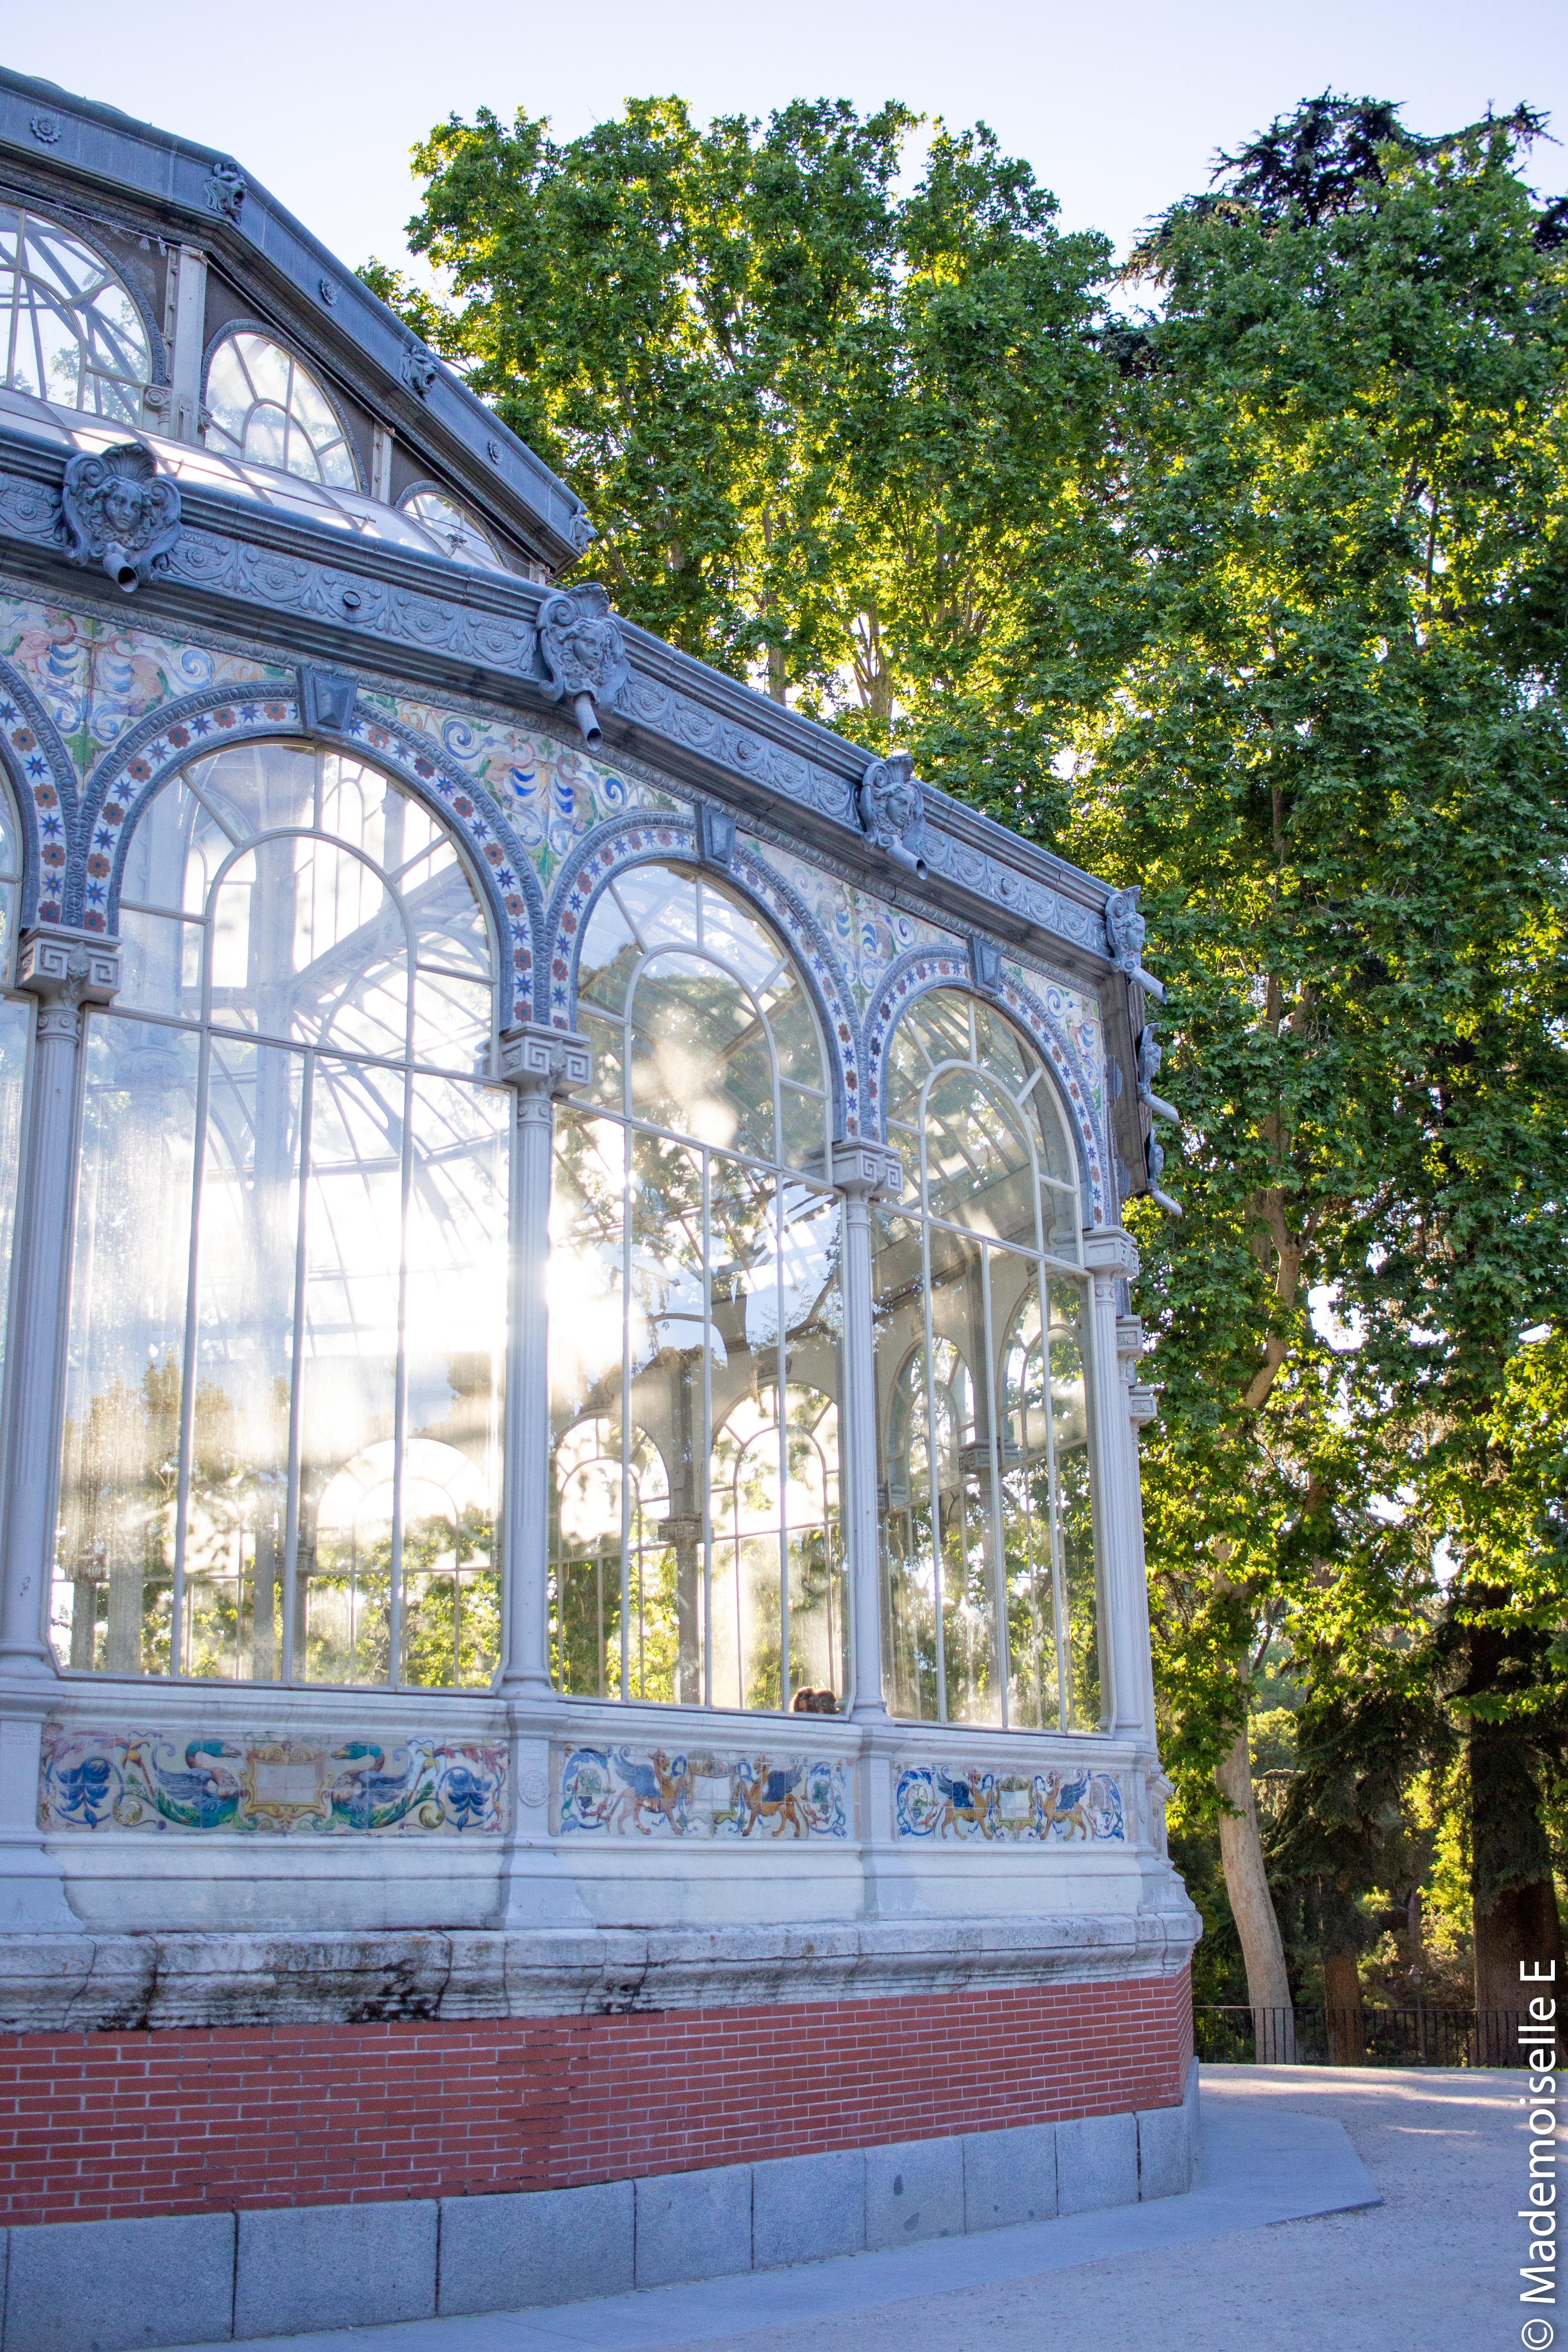 madrid-city-guide-bonnes-adresses-palacio-de-cristal-2-mademoiselle-e